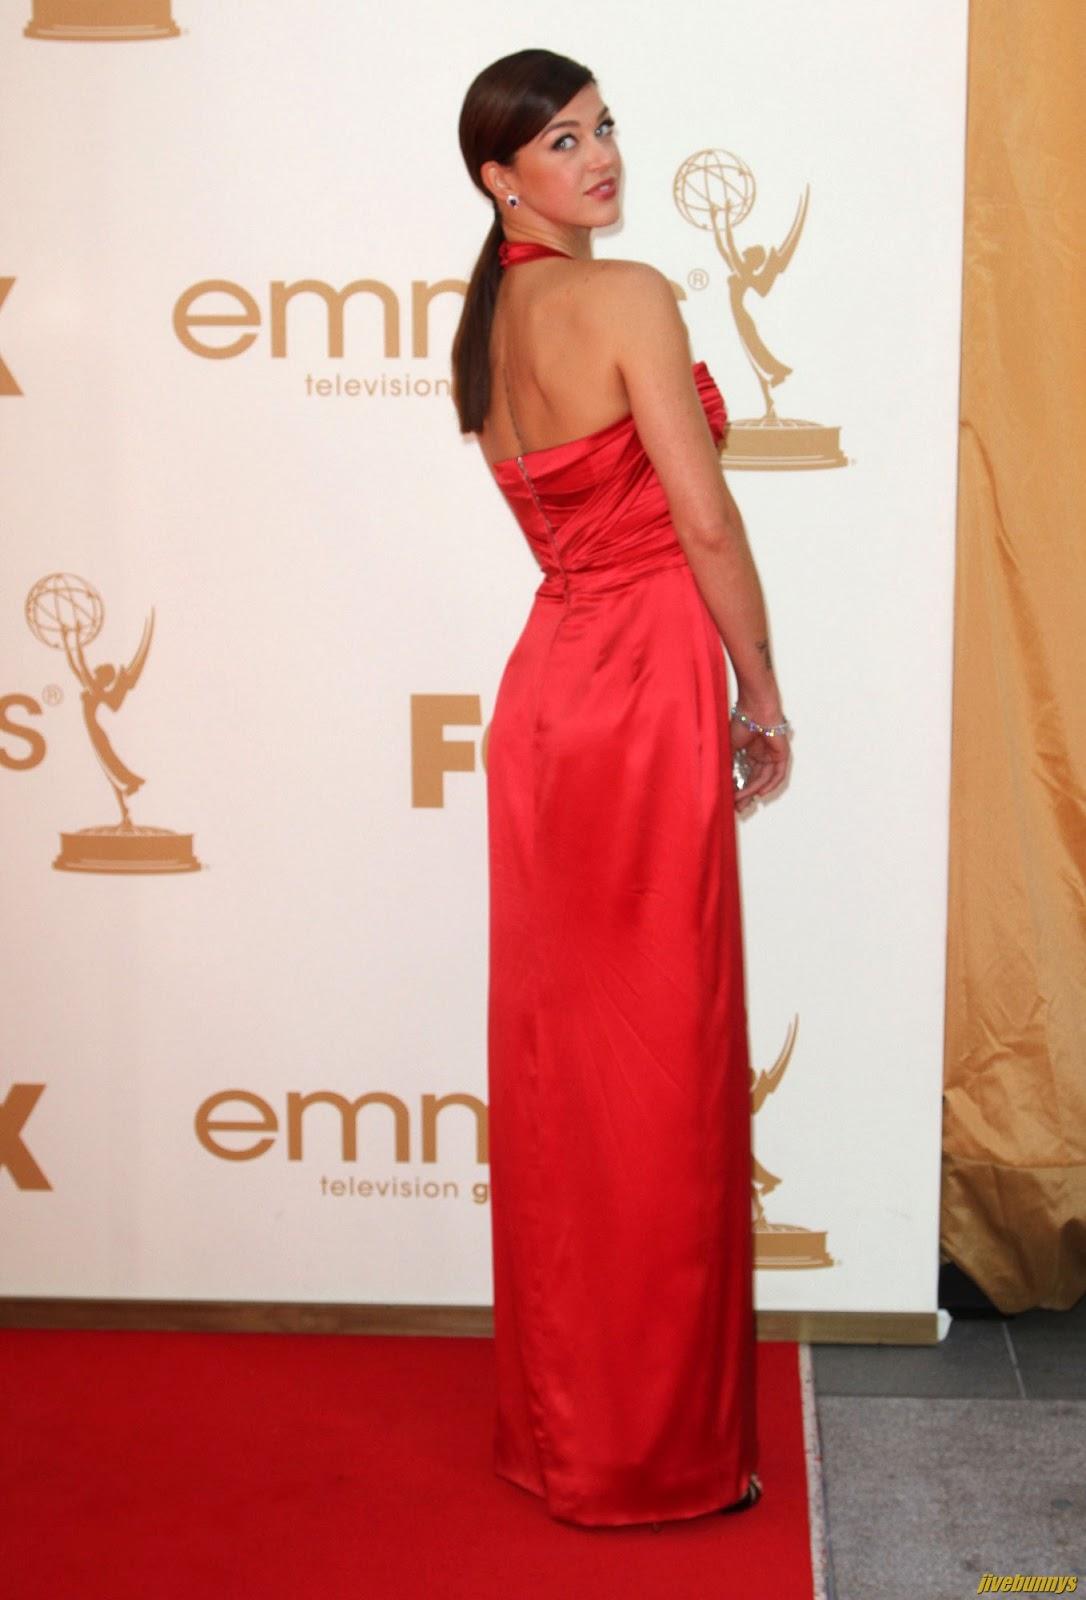 Jivebunnys Female Celebrity Picture Gallery: Adrianne ... Jennifer Aniston Movies